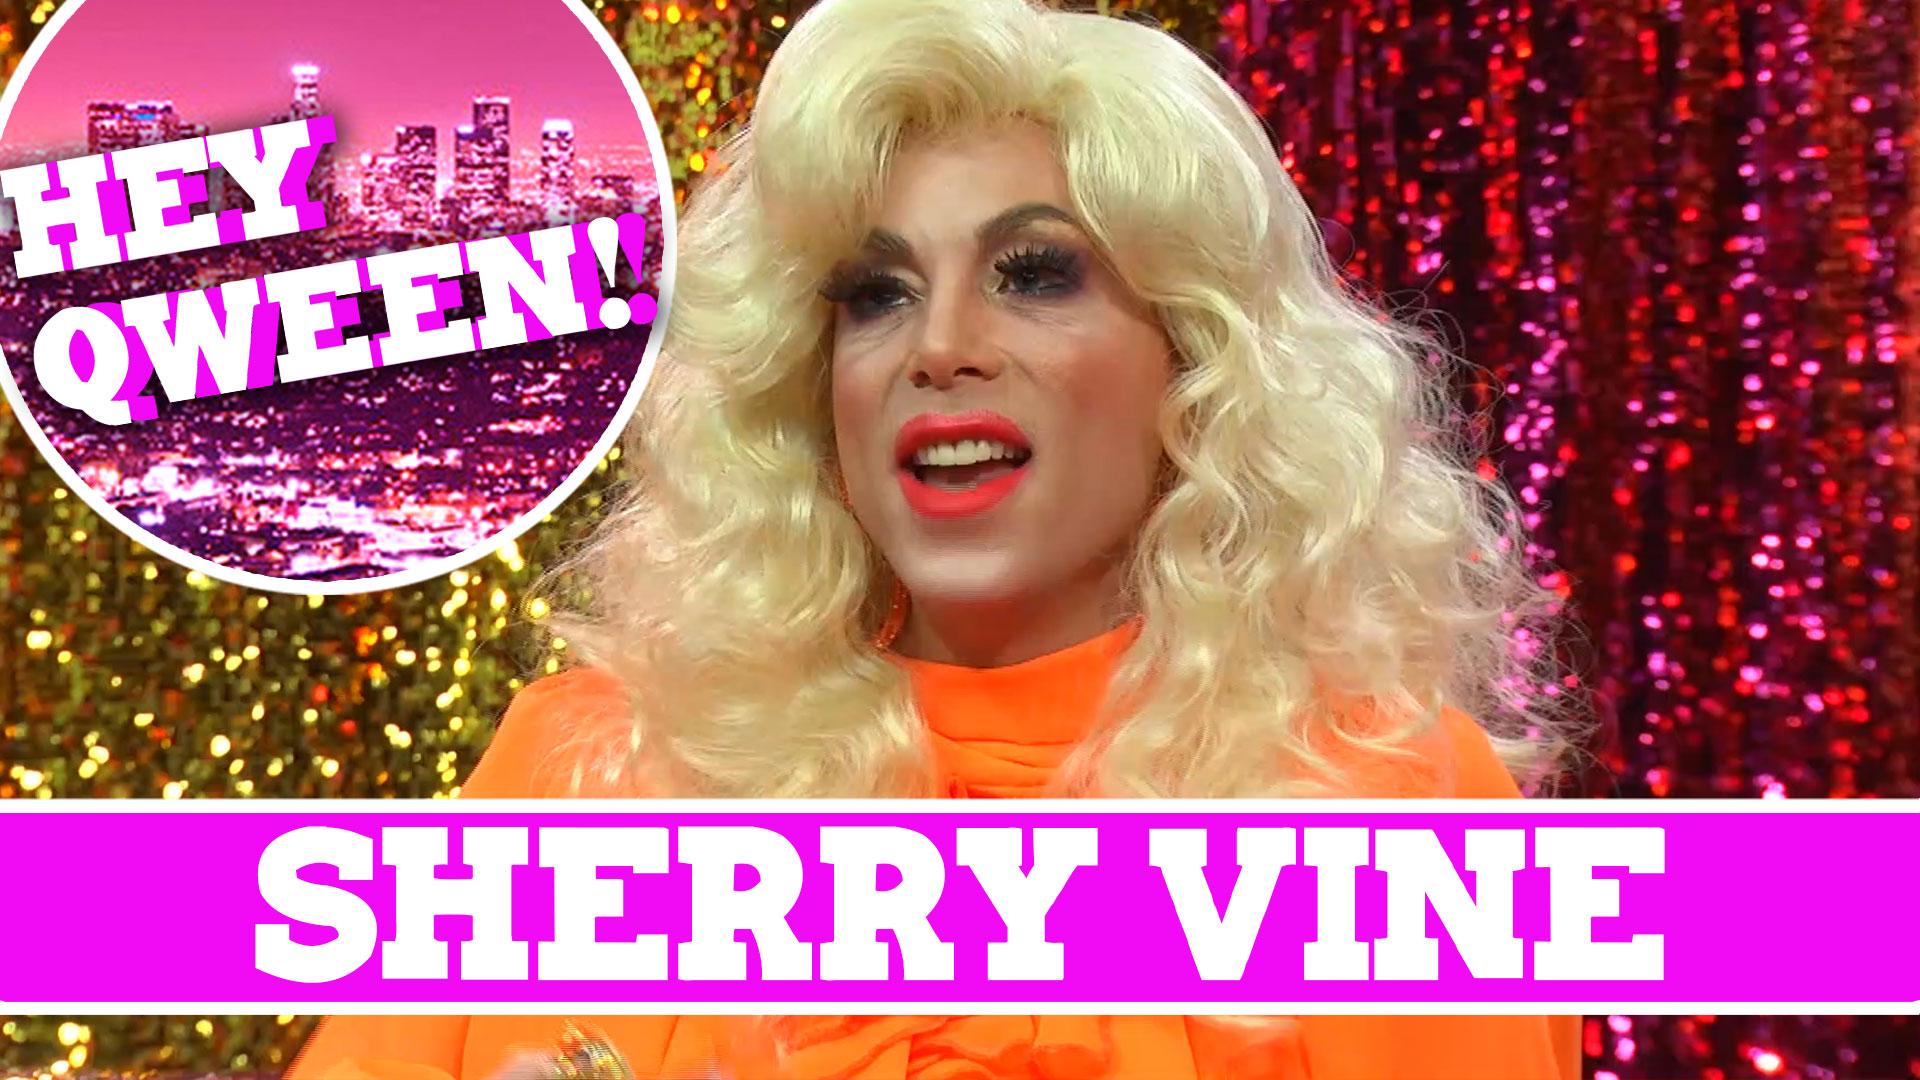 Sherry Vine on Hey Qween with Jonny McGovern!